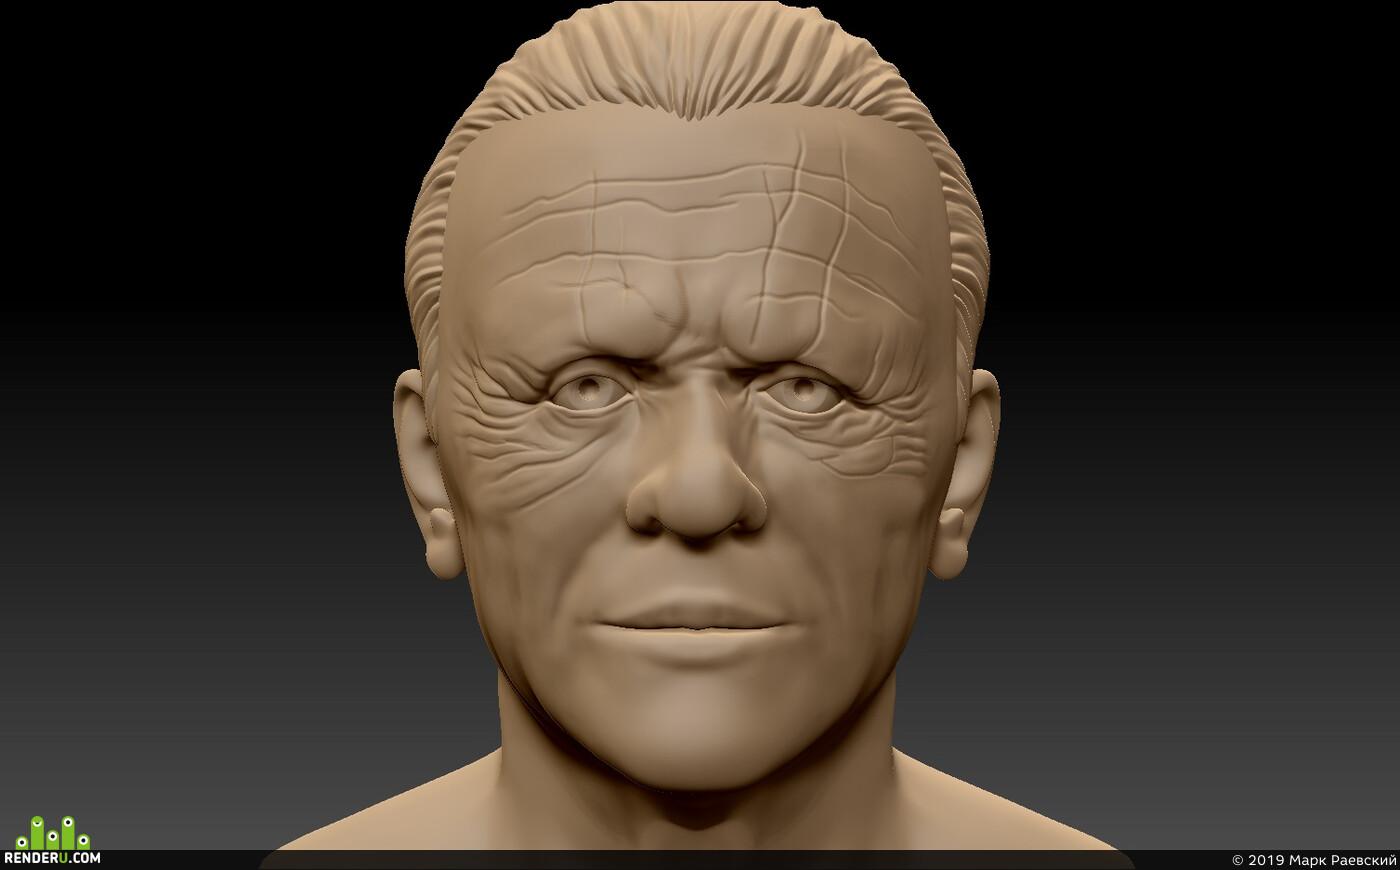 голова, Актёр, 3d модель